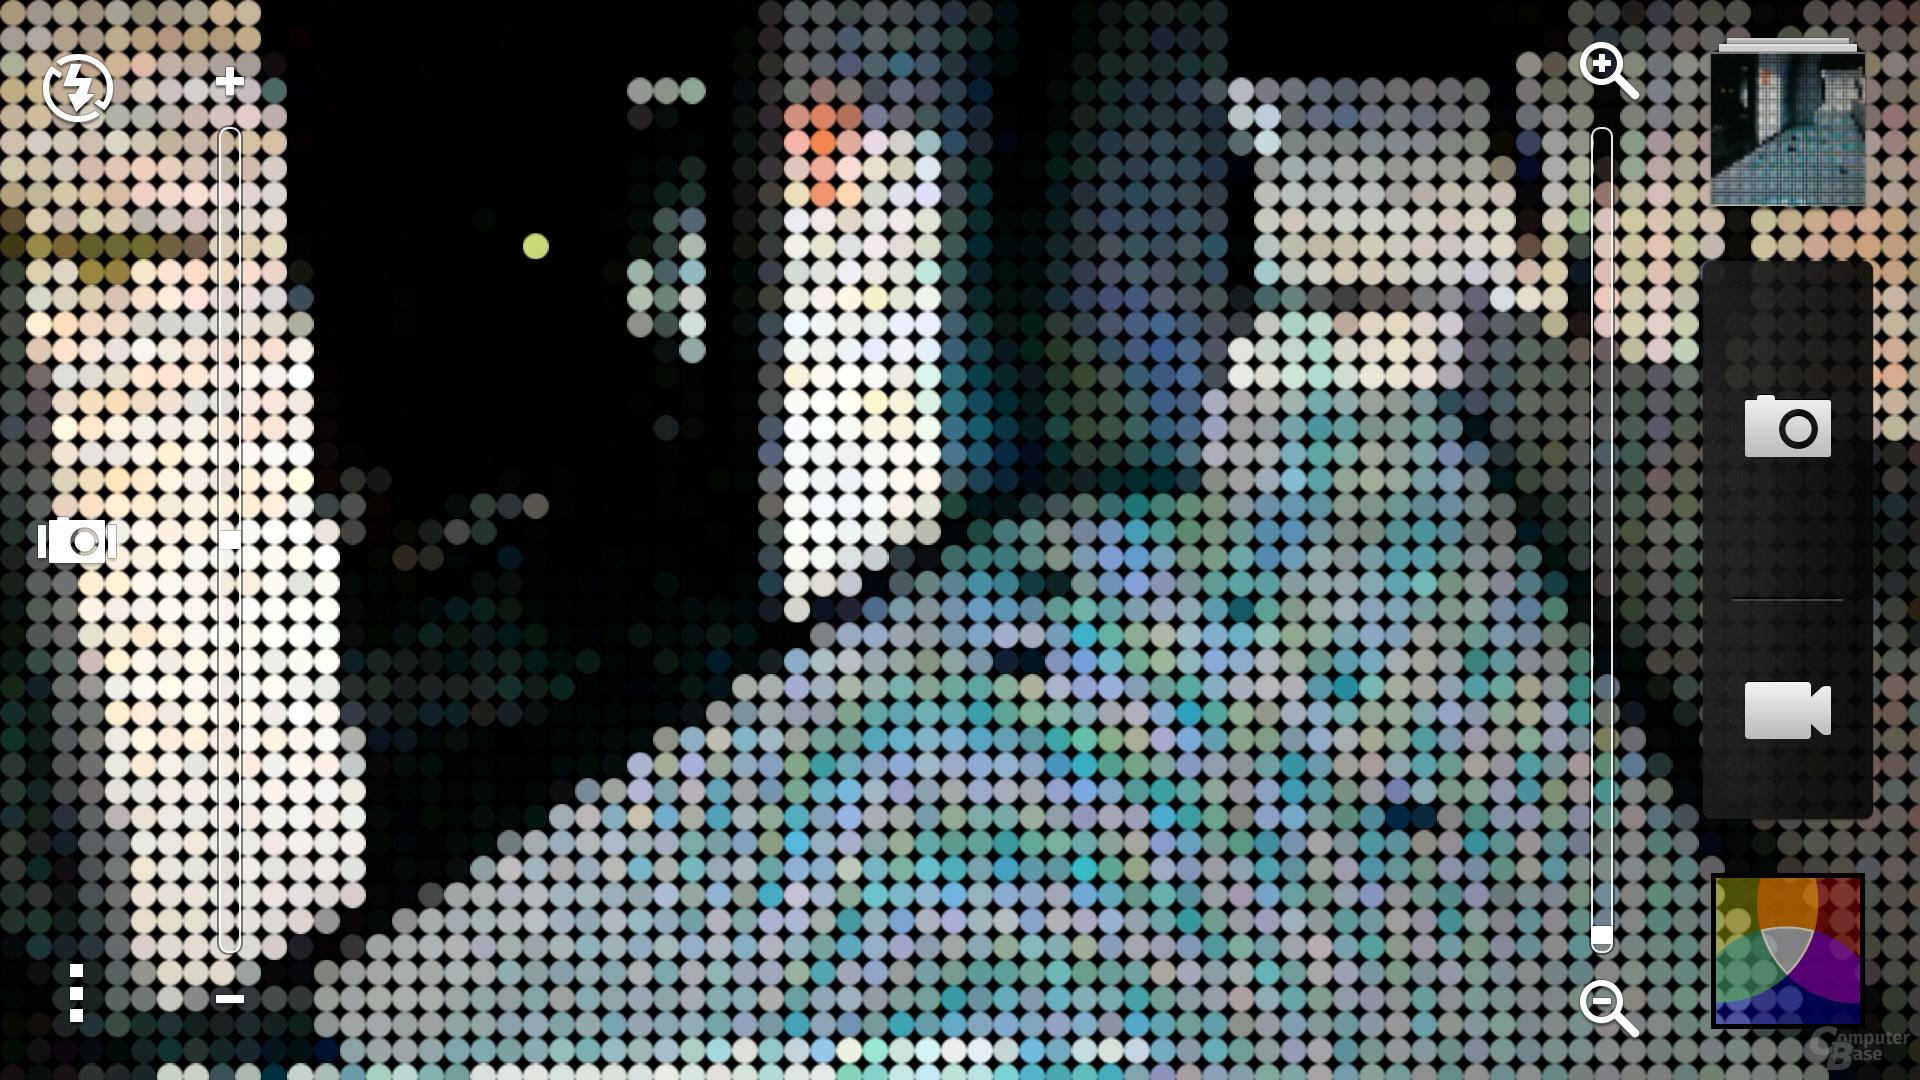 HTC One Kamera-Effekte